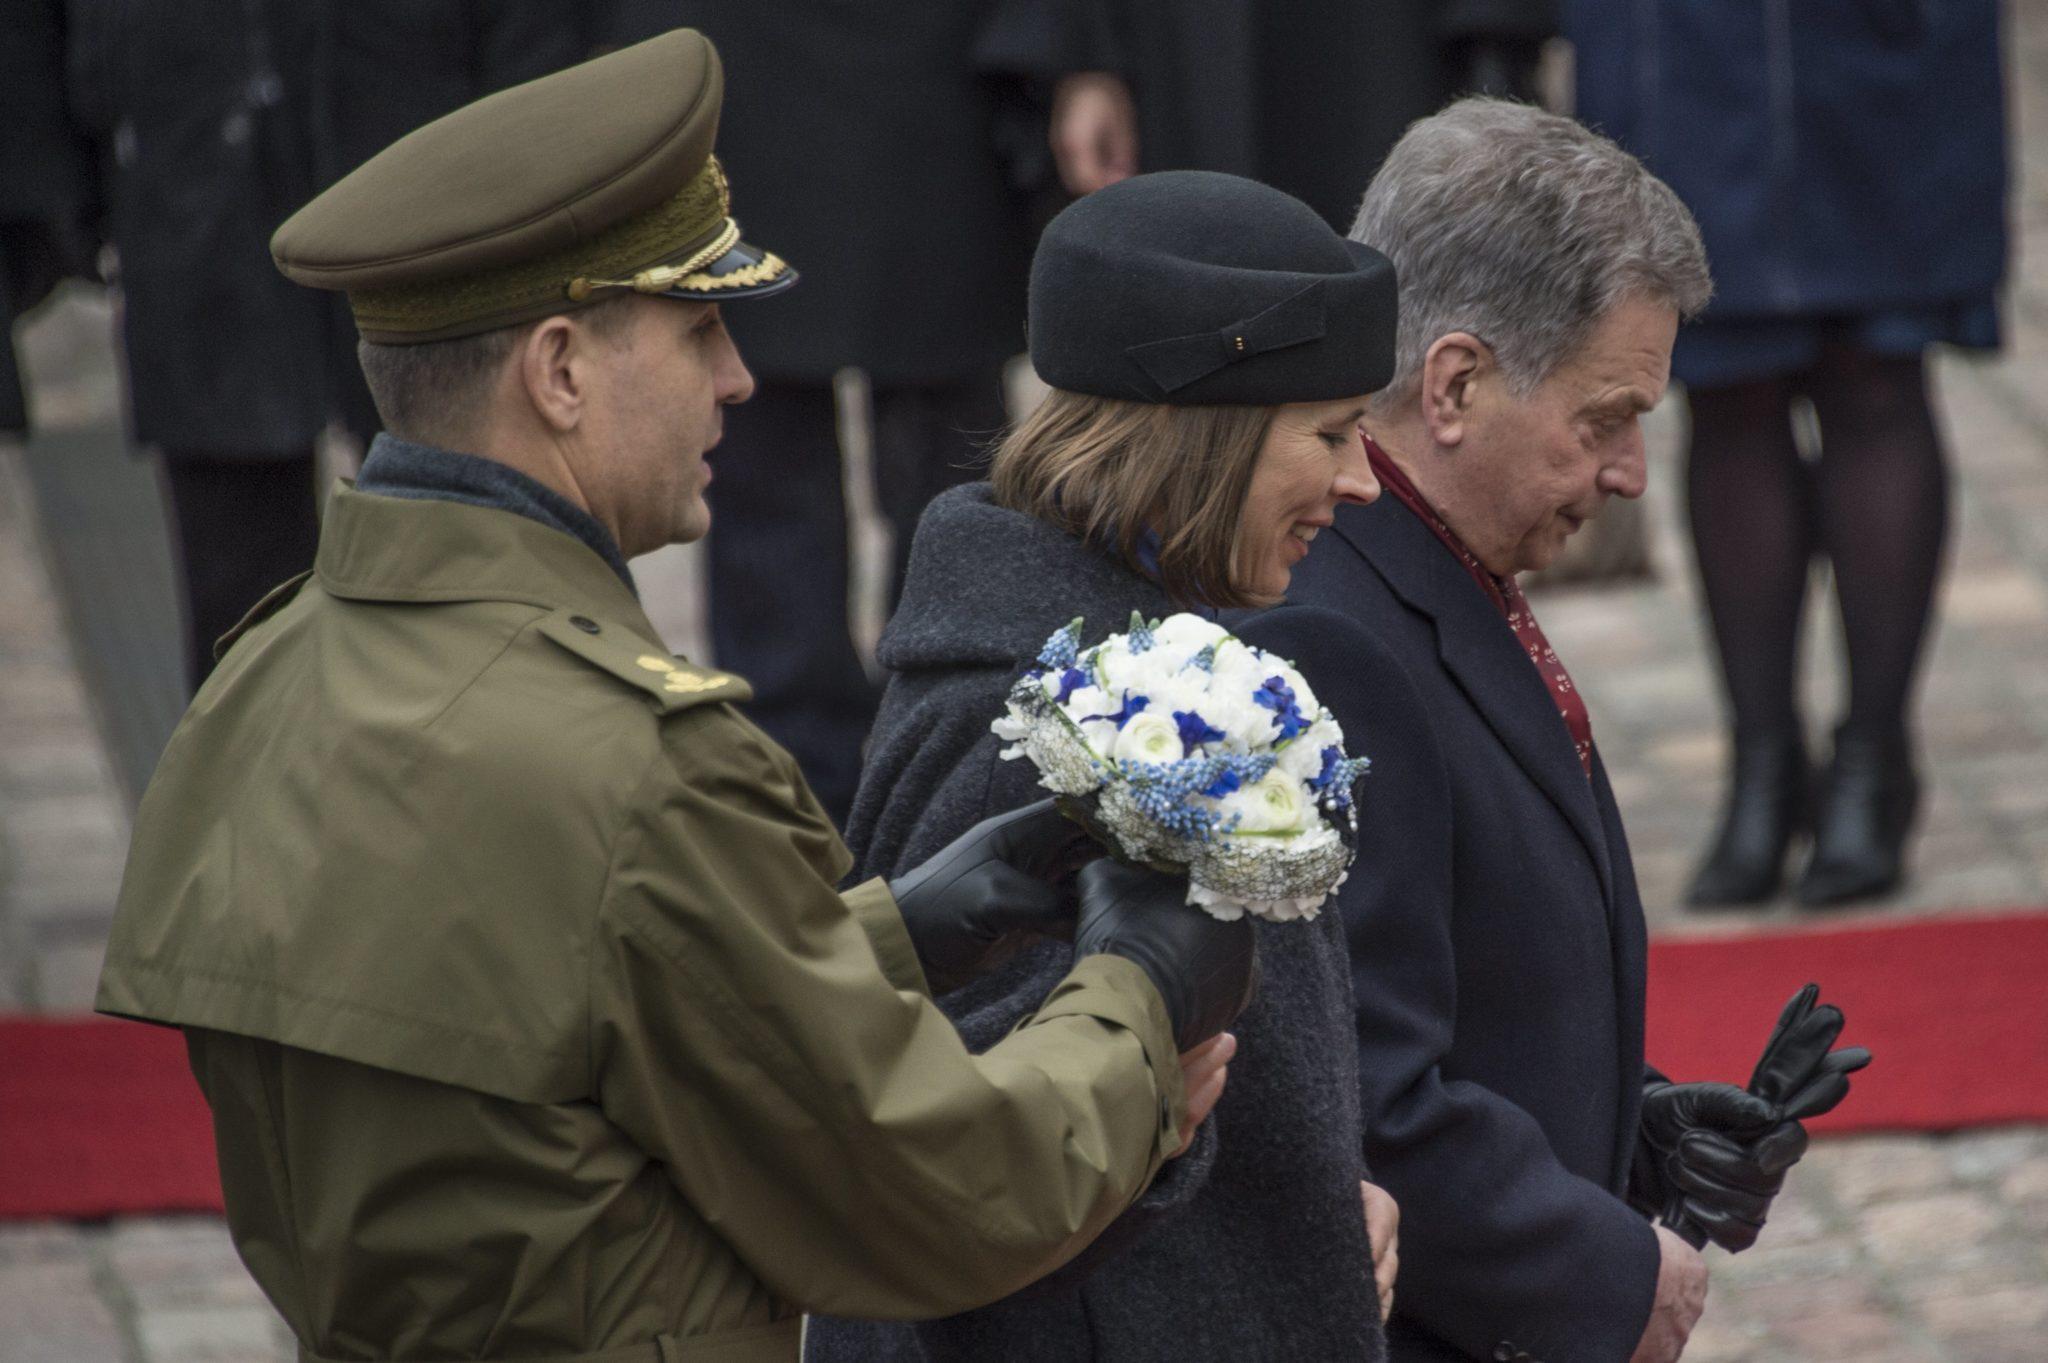 Finlandia: wizyta prezydenta Estonii Kersti Kaljulaida w Finlandii (foto. PAP/EPA/MARKKU OJALA)